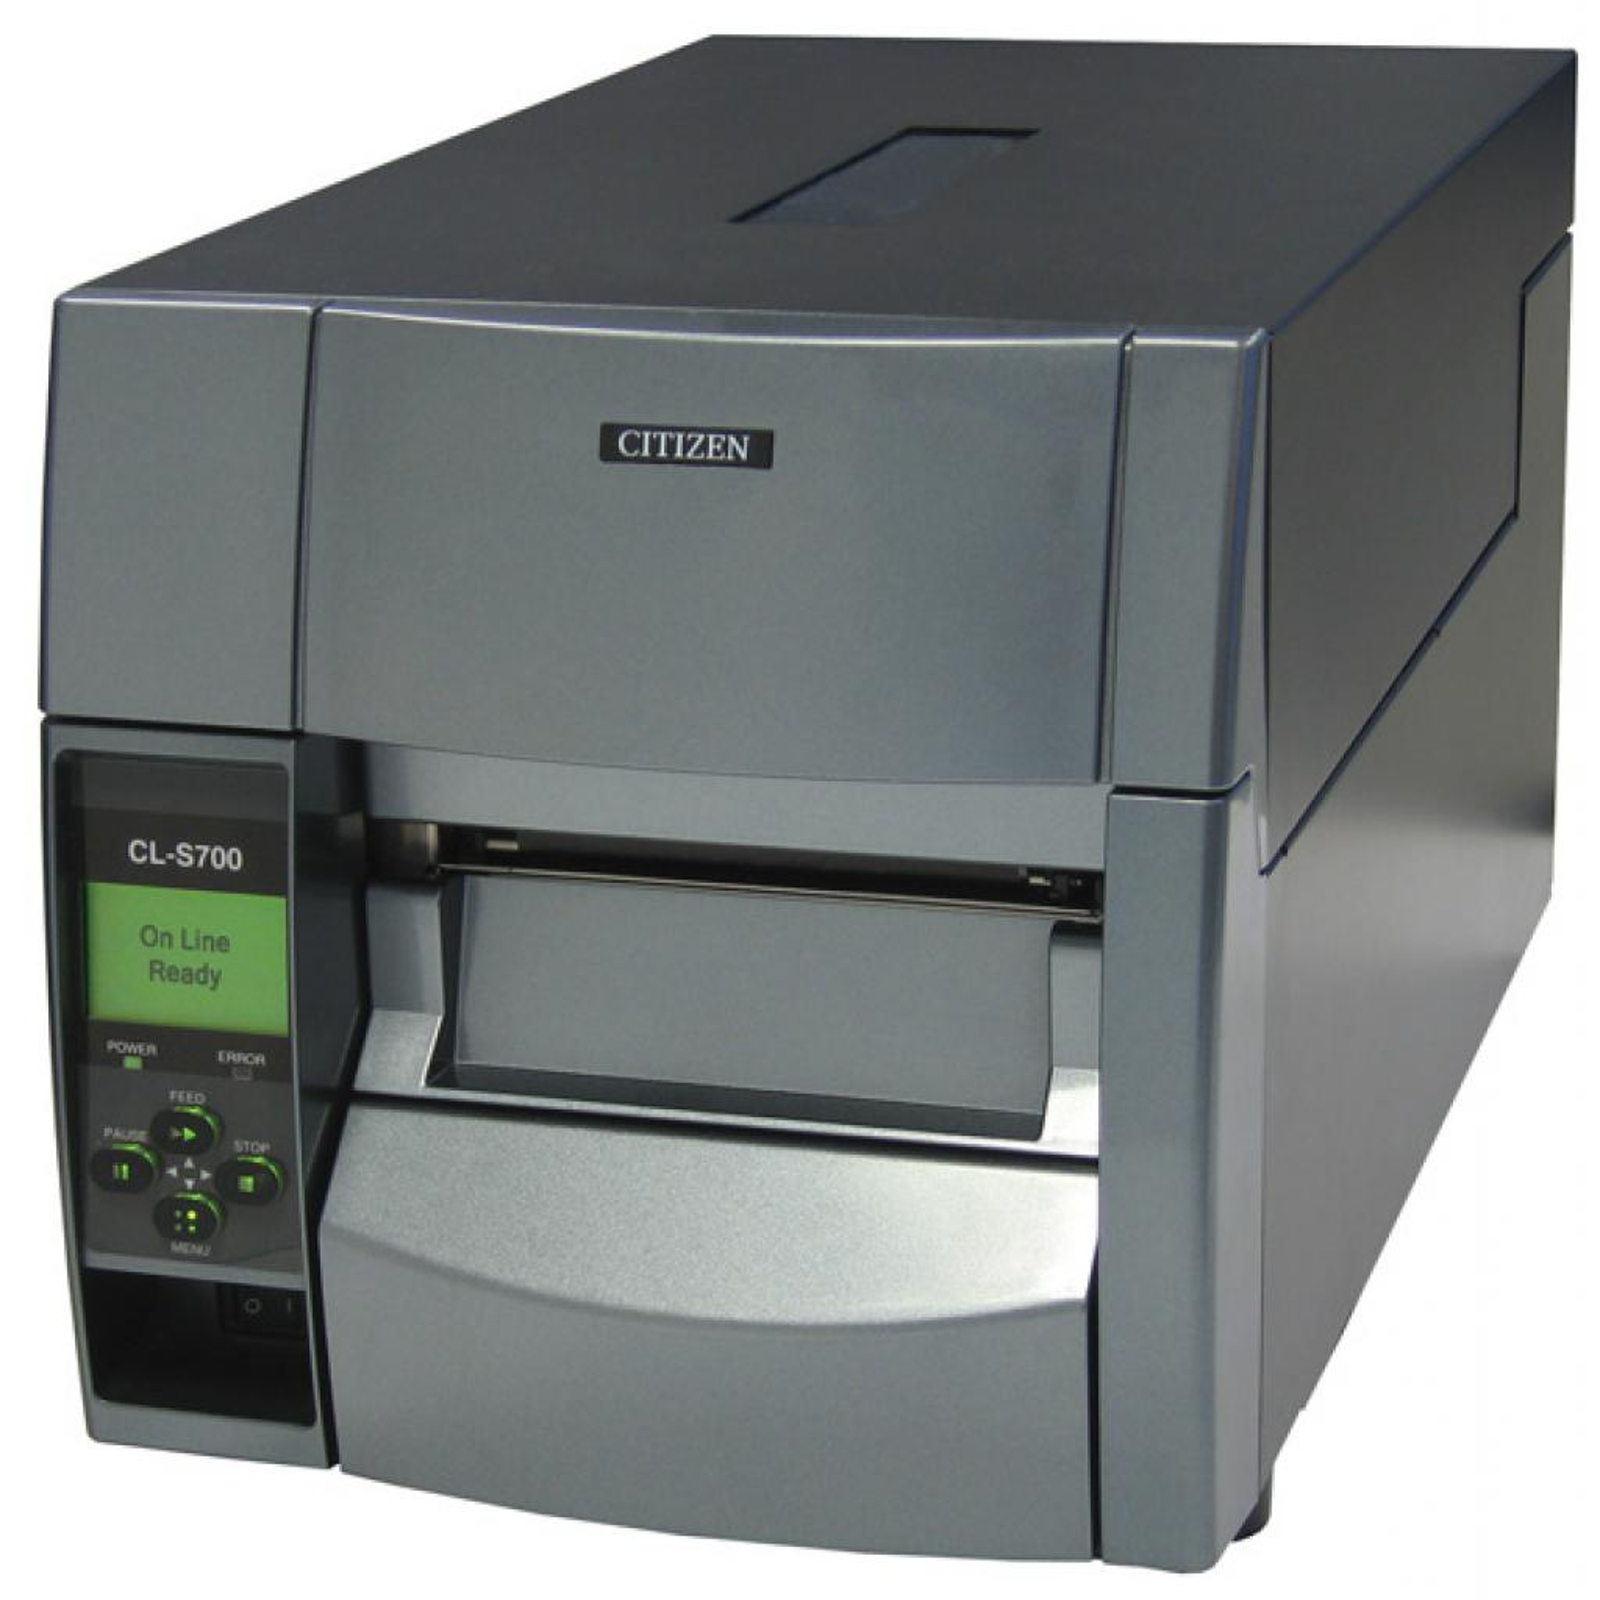 Принтер этикеток Citizen CL-S700 (1000793)